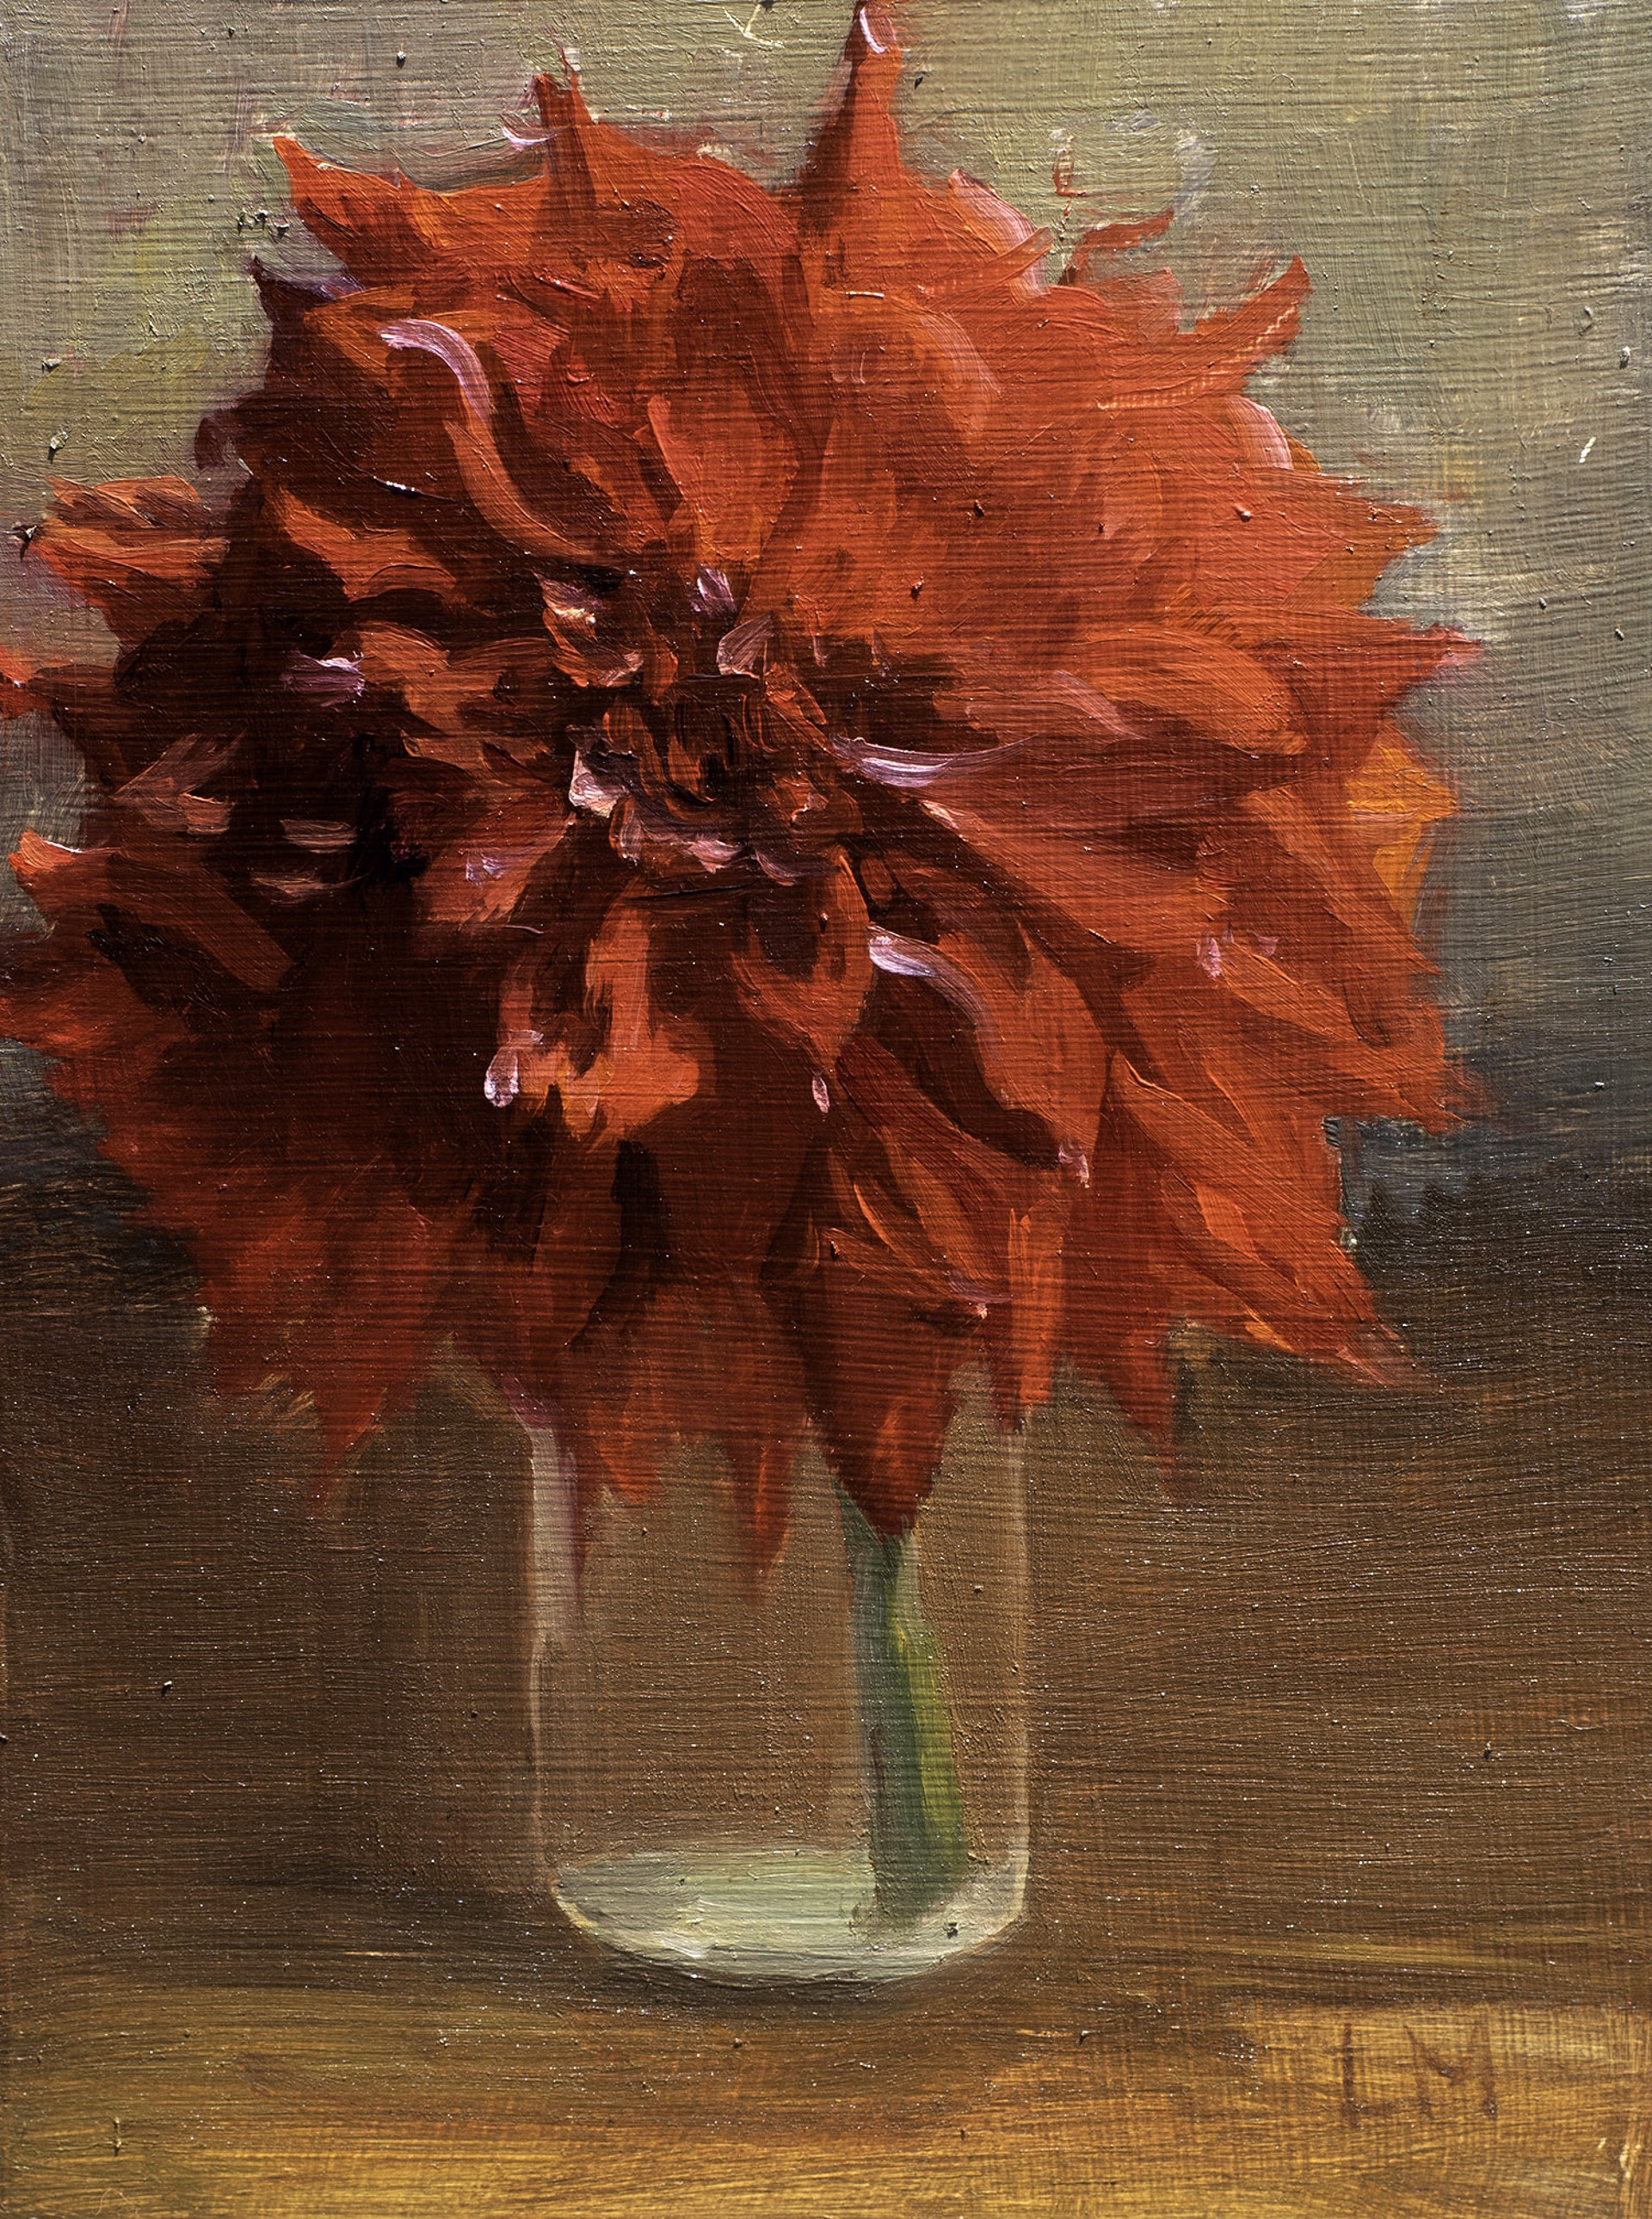 Red Dahlia by Laura Murphey